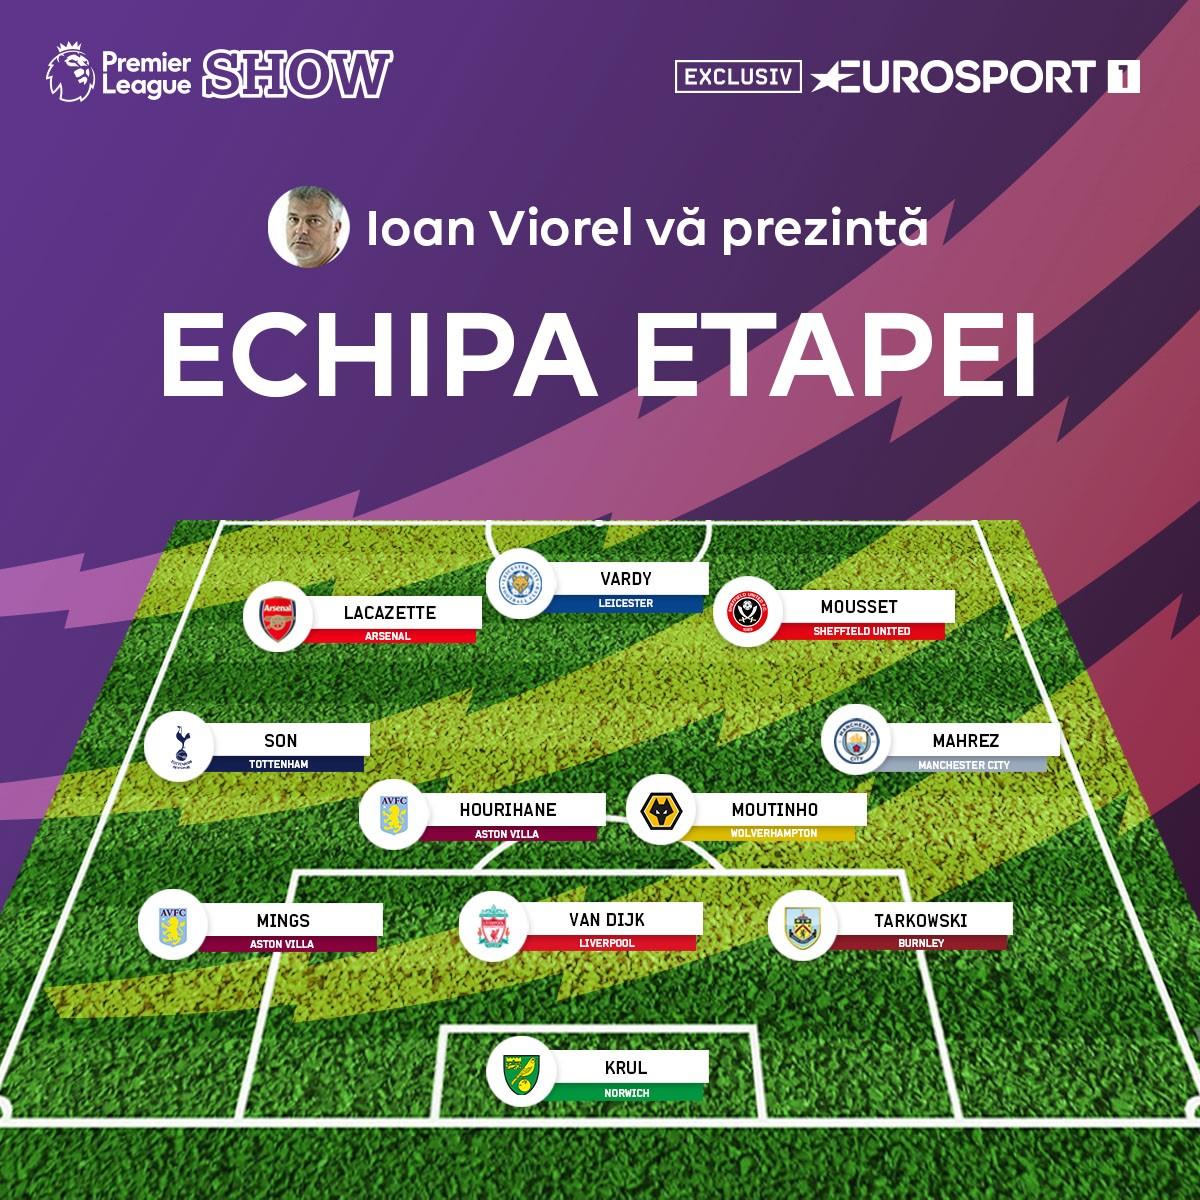 https://i.eurosport.com/2019/11/27/2725323.jpg